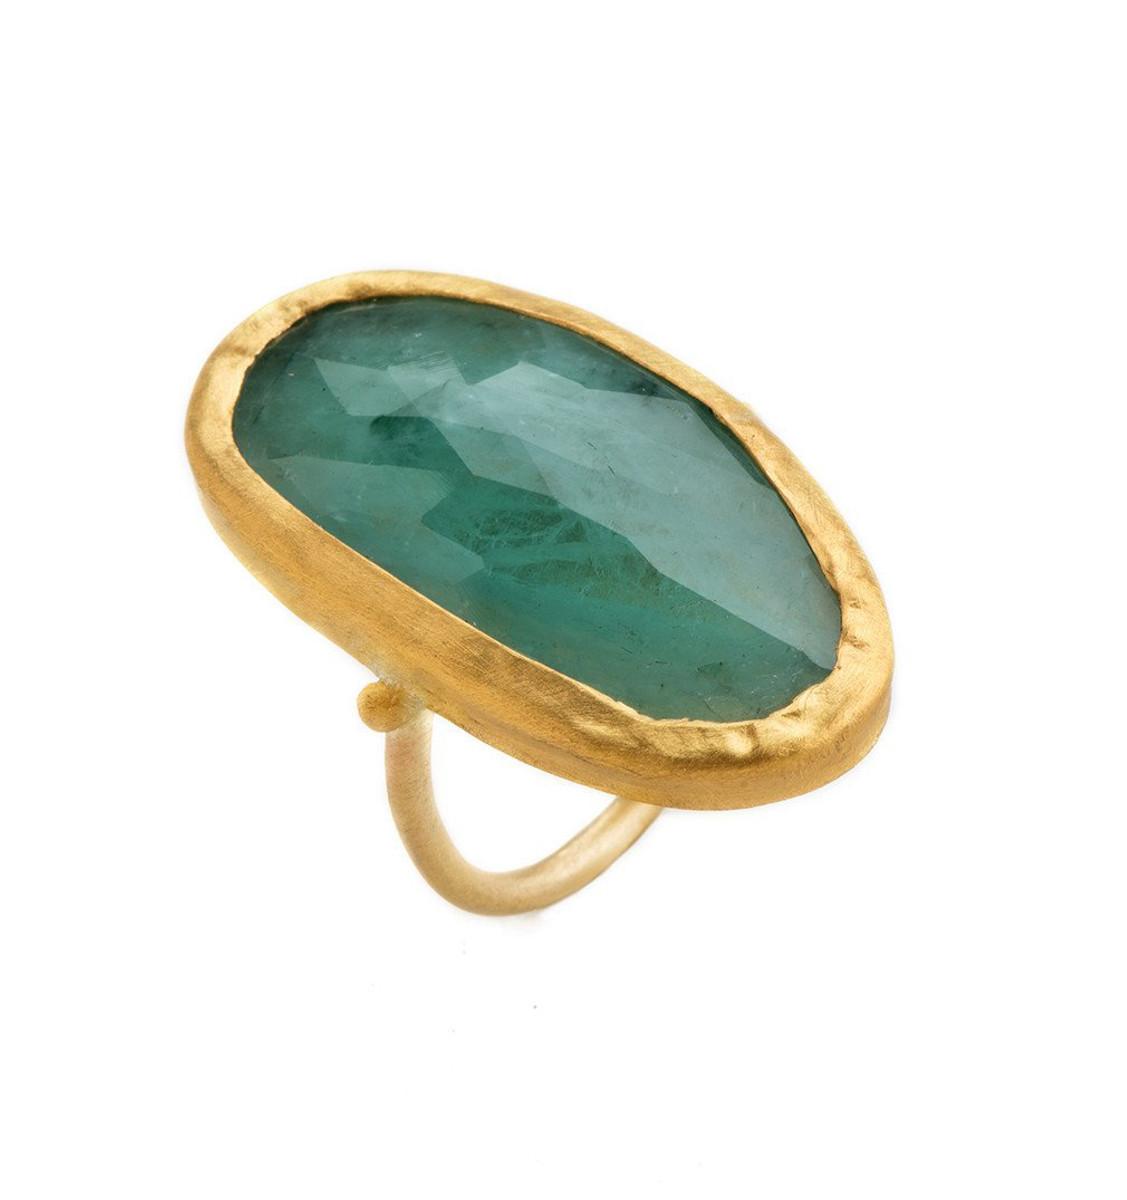 Great Emerald Gold Ring by Nava Zahavi - New Arrival